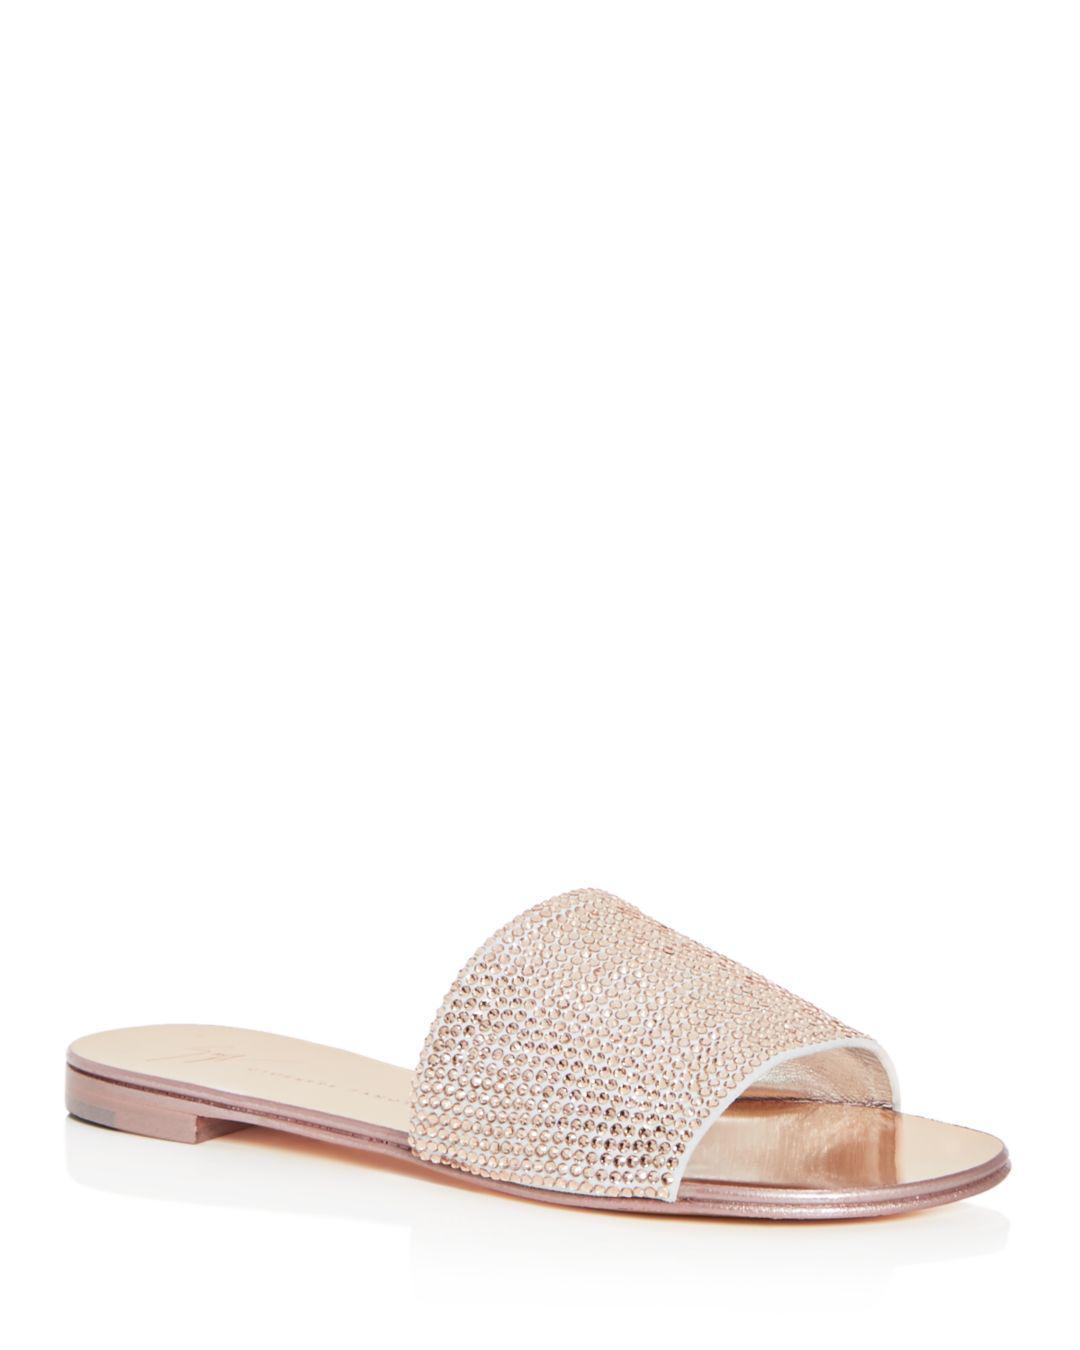 ff508a19b2b Giuseppe Zanotti Women s Swarovski Crystal Embellished Slide Sandals ...